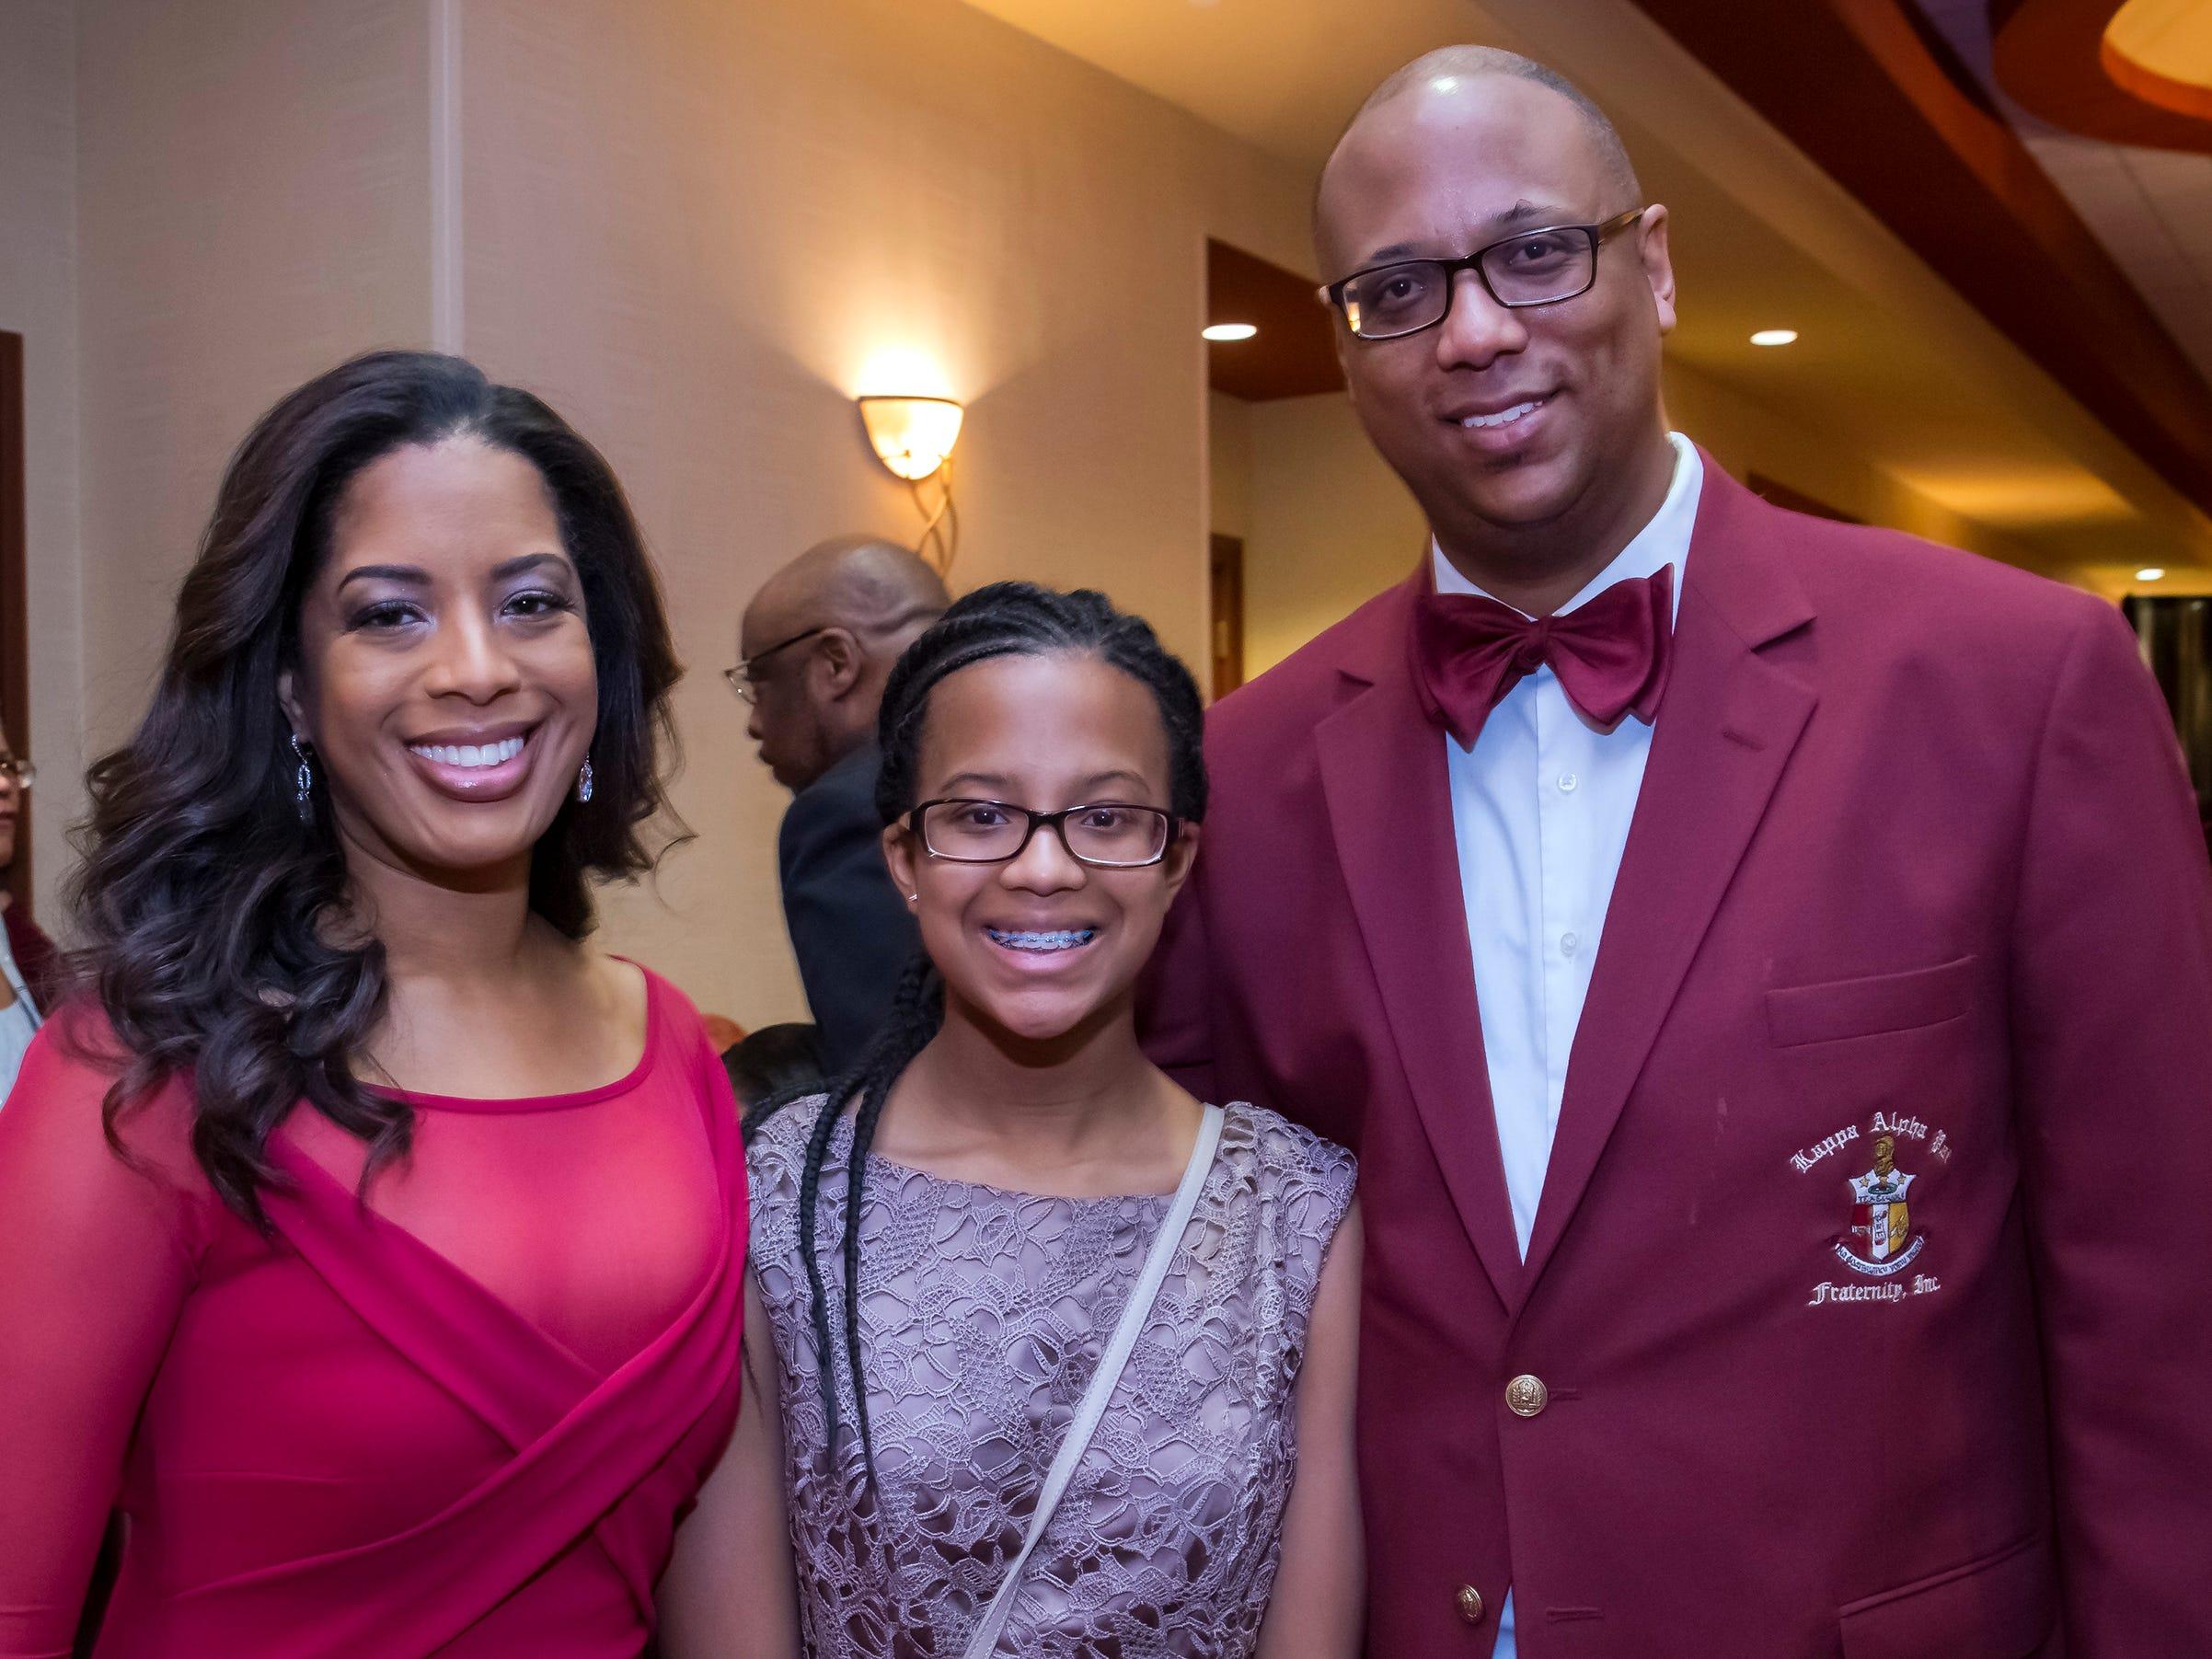 Keta, Amya and Steven Barnes at the Murfreesboro Alumni Chapter of Kappa Alpha Psi Fraternity Beautillion held at Embassy Suites.